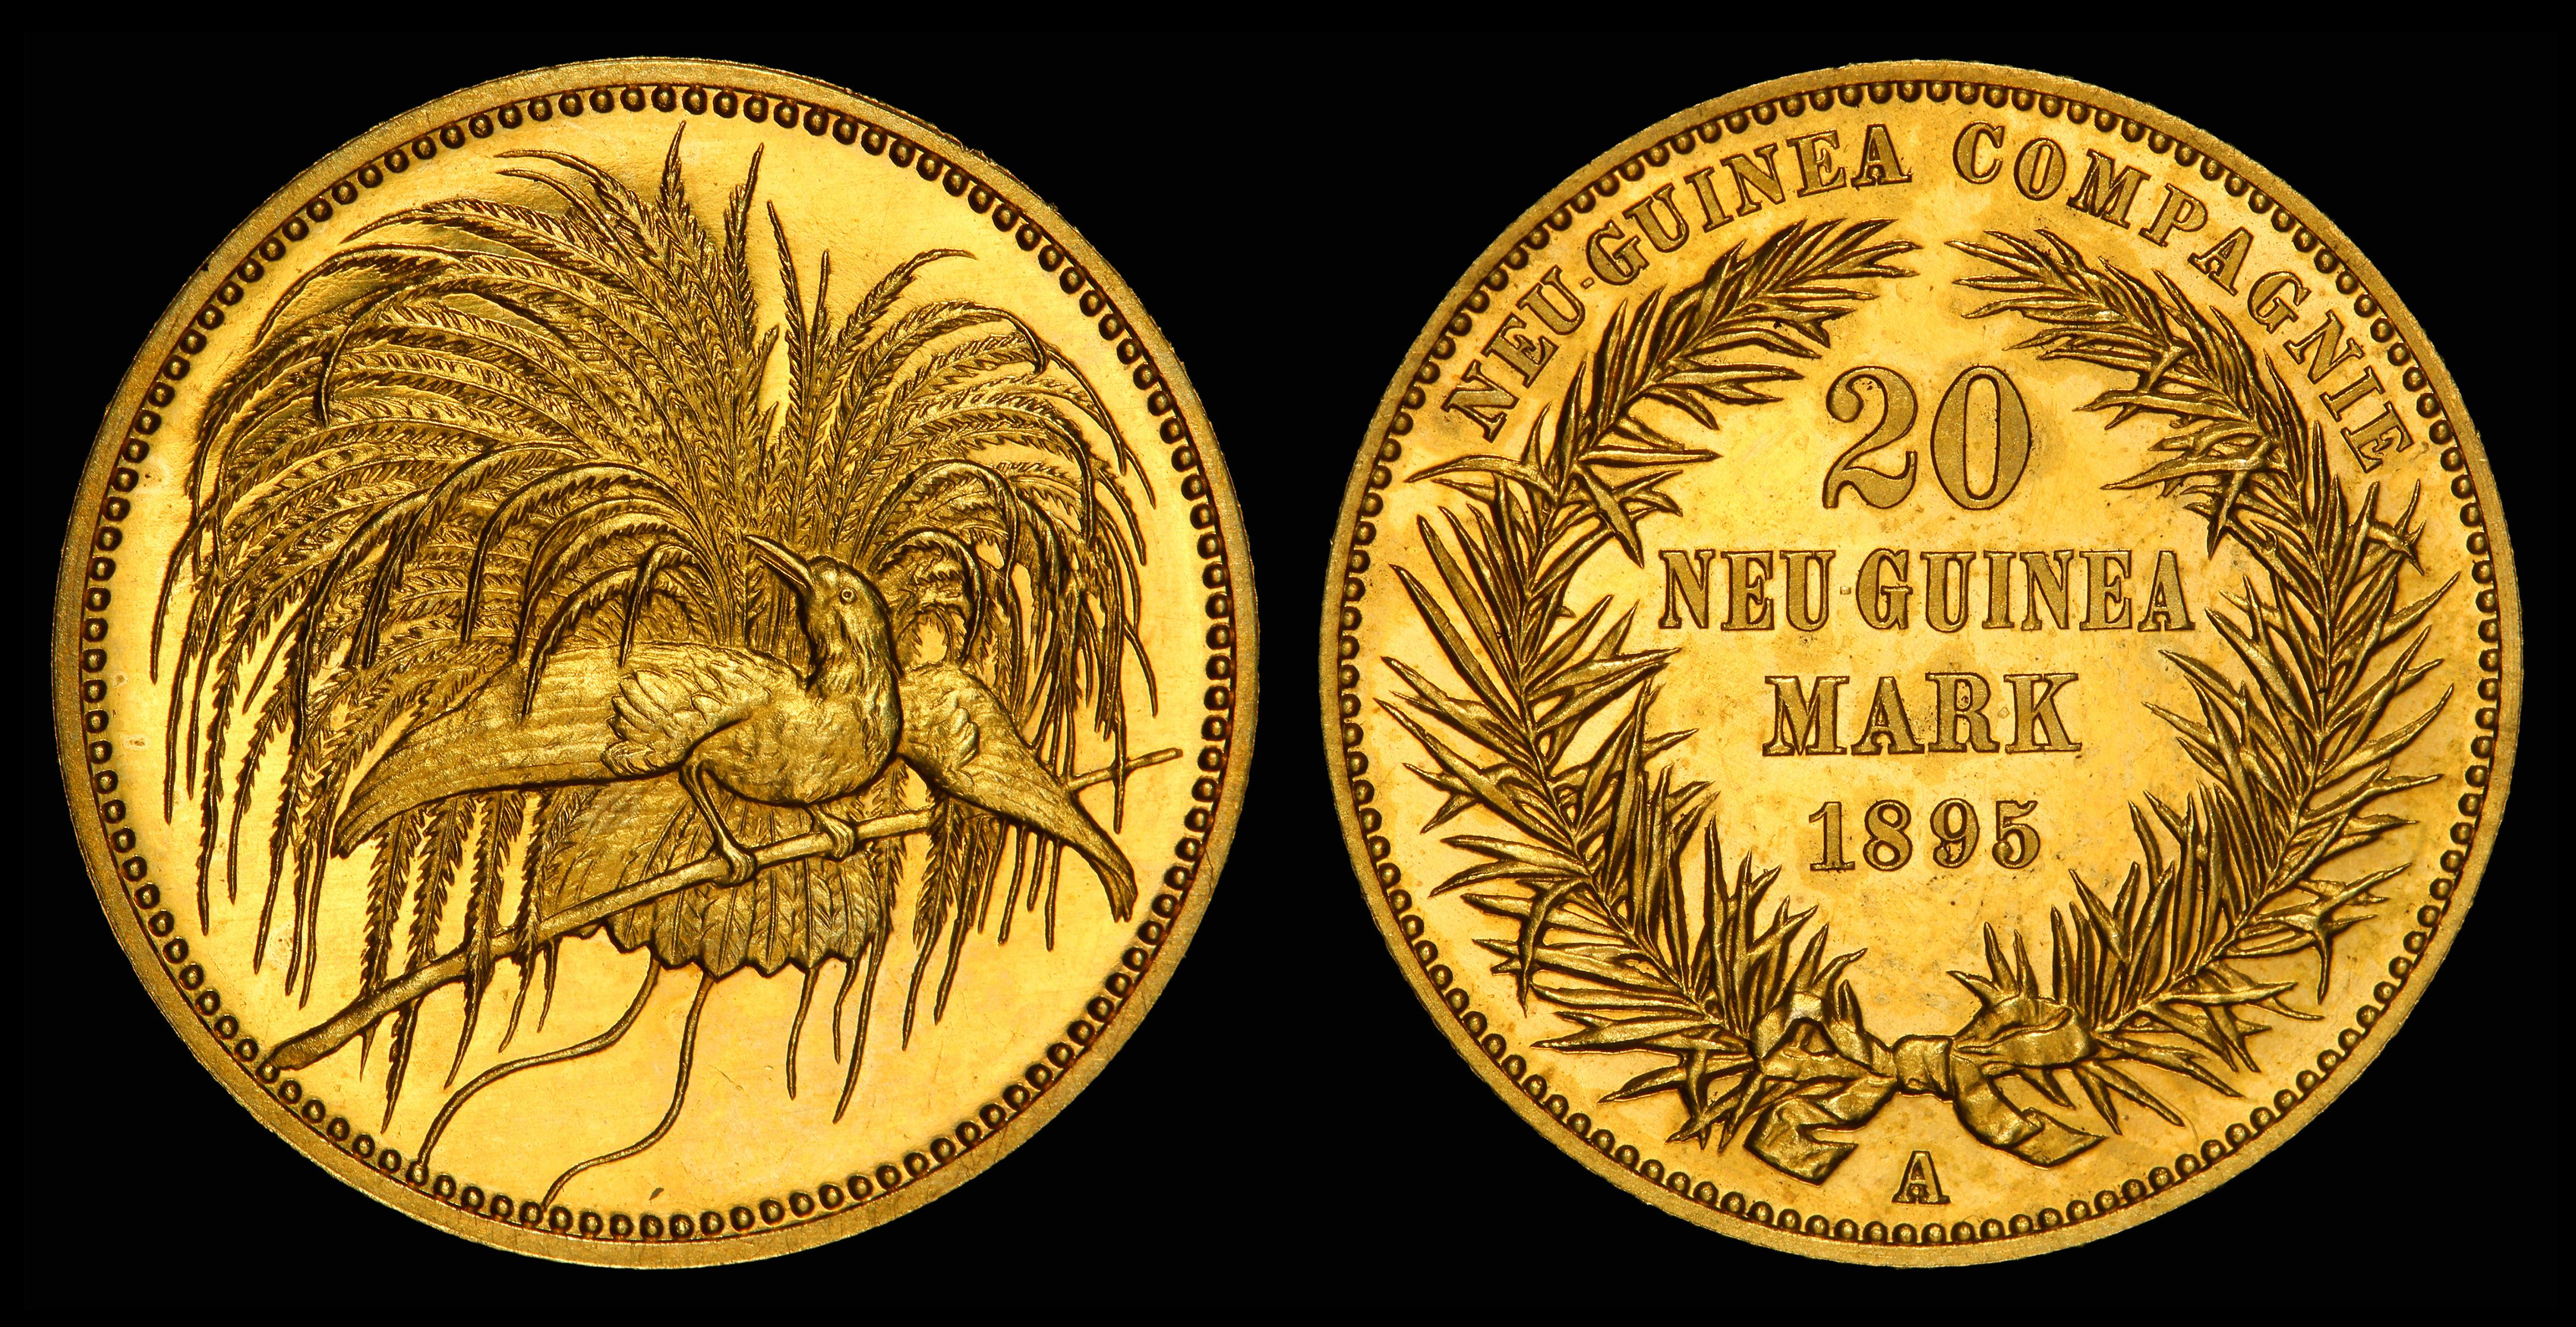 German New Guinea - Wikipedia